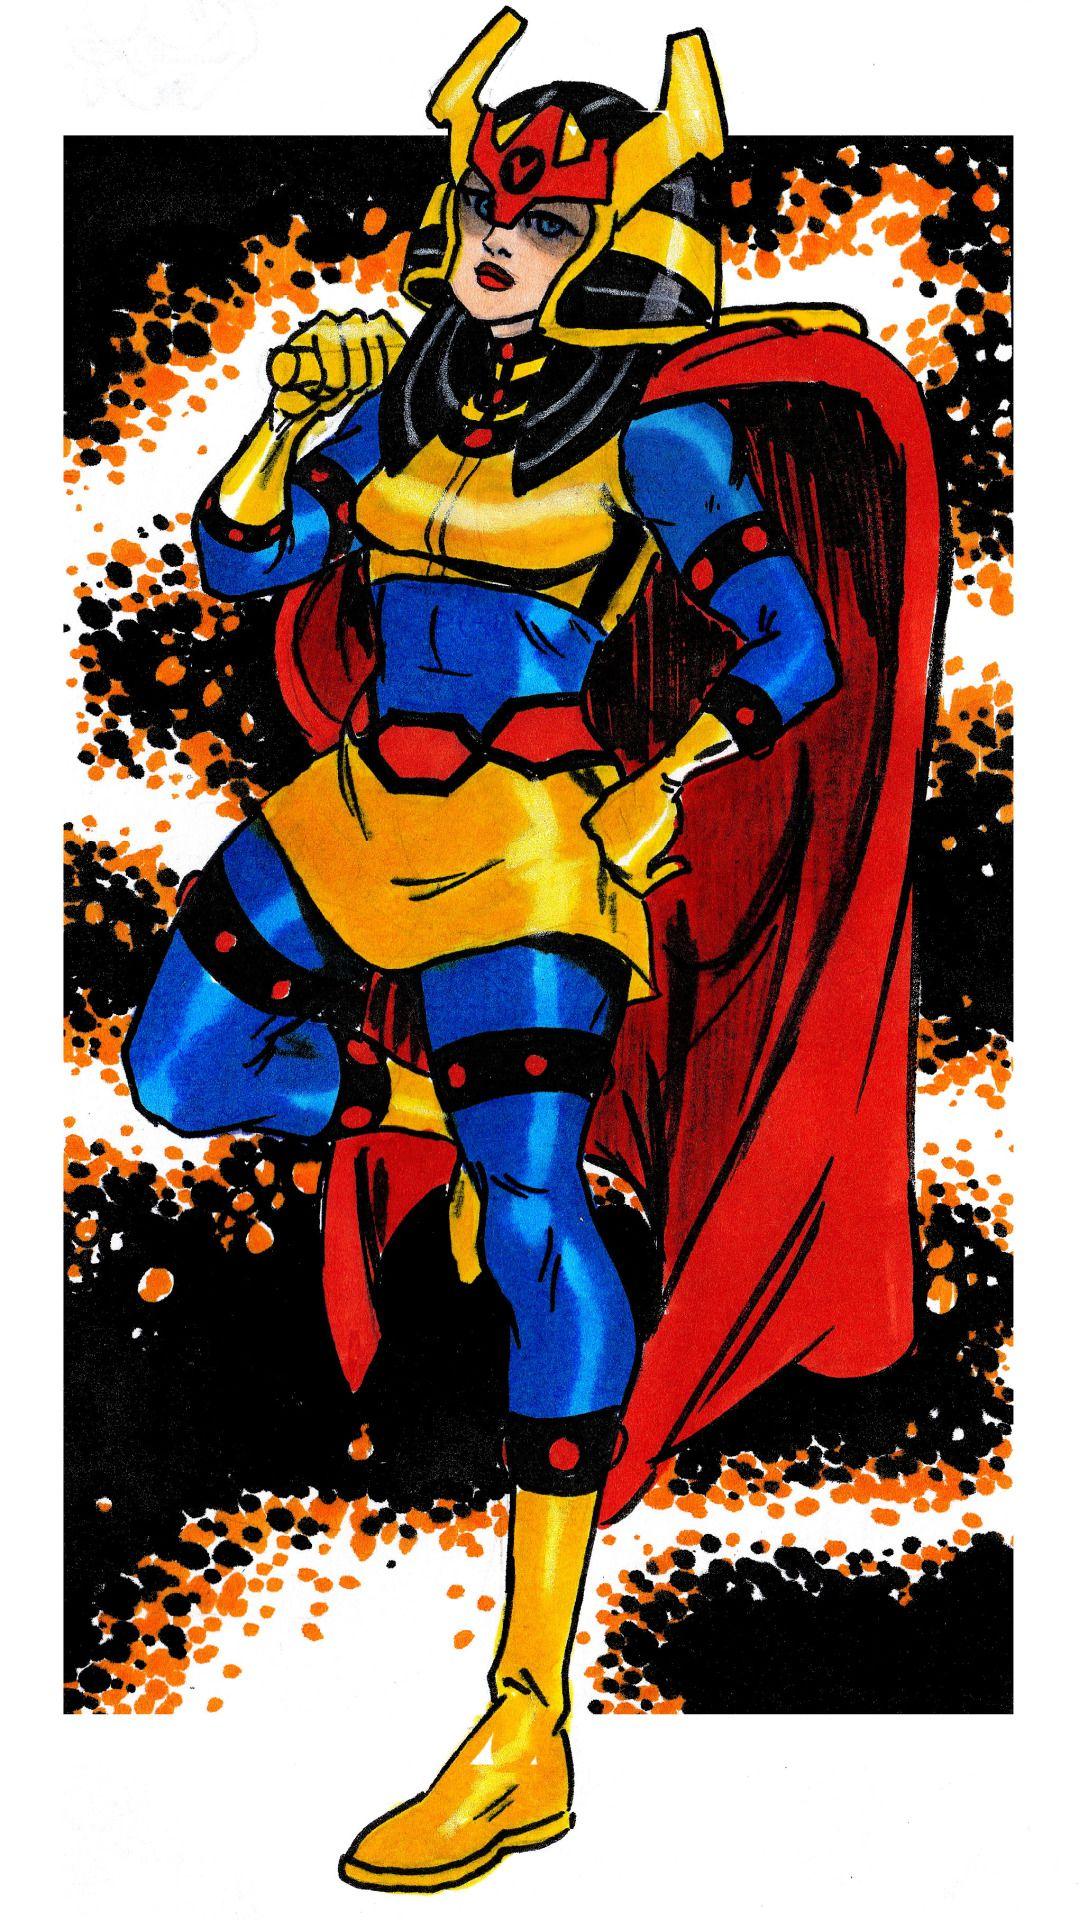 Big Barda,former Captain of Darkseid's Female Fur